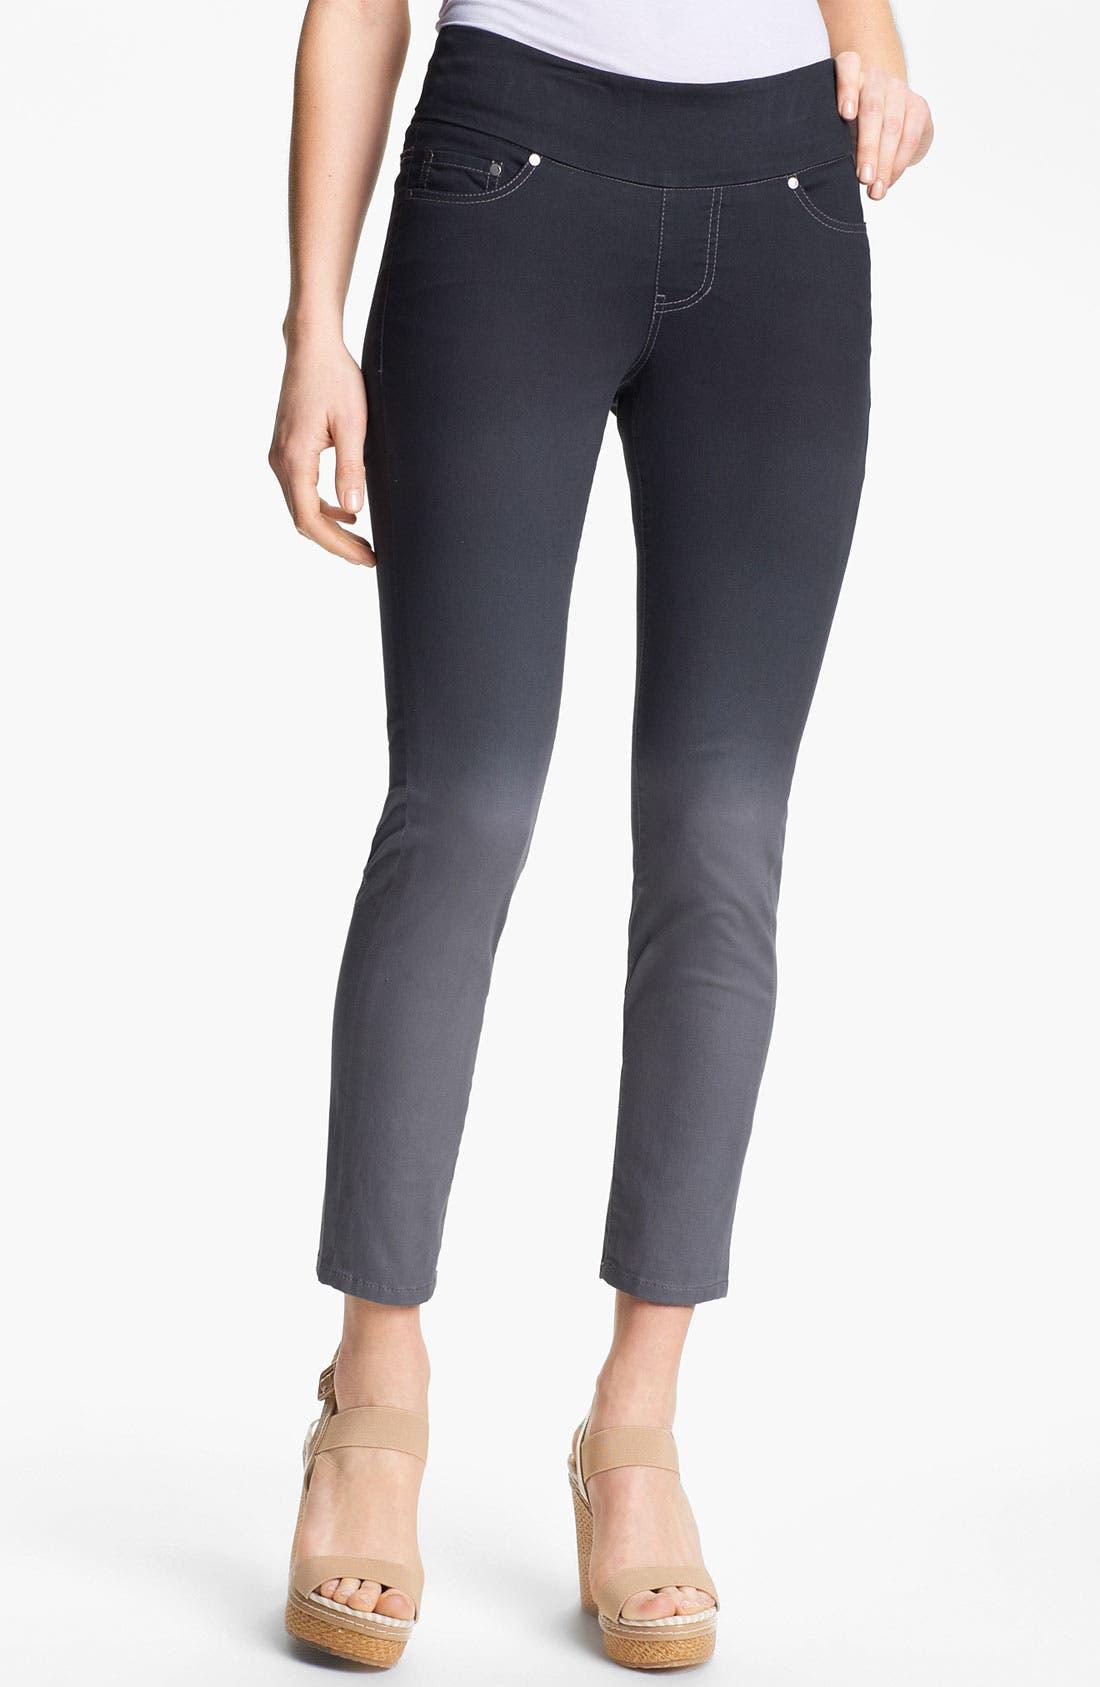 Main Image - Jag Jeans 'Amelia' Pull-On Slim Ankle Jeans